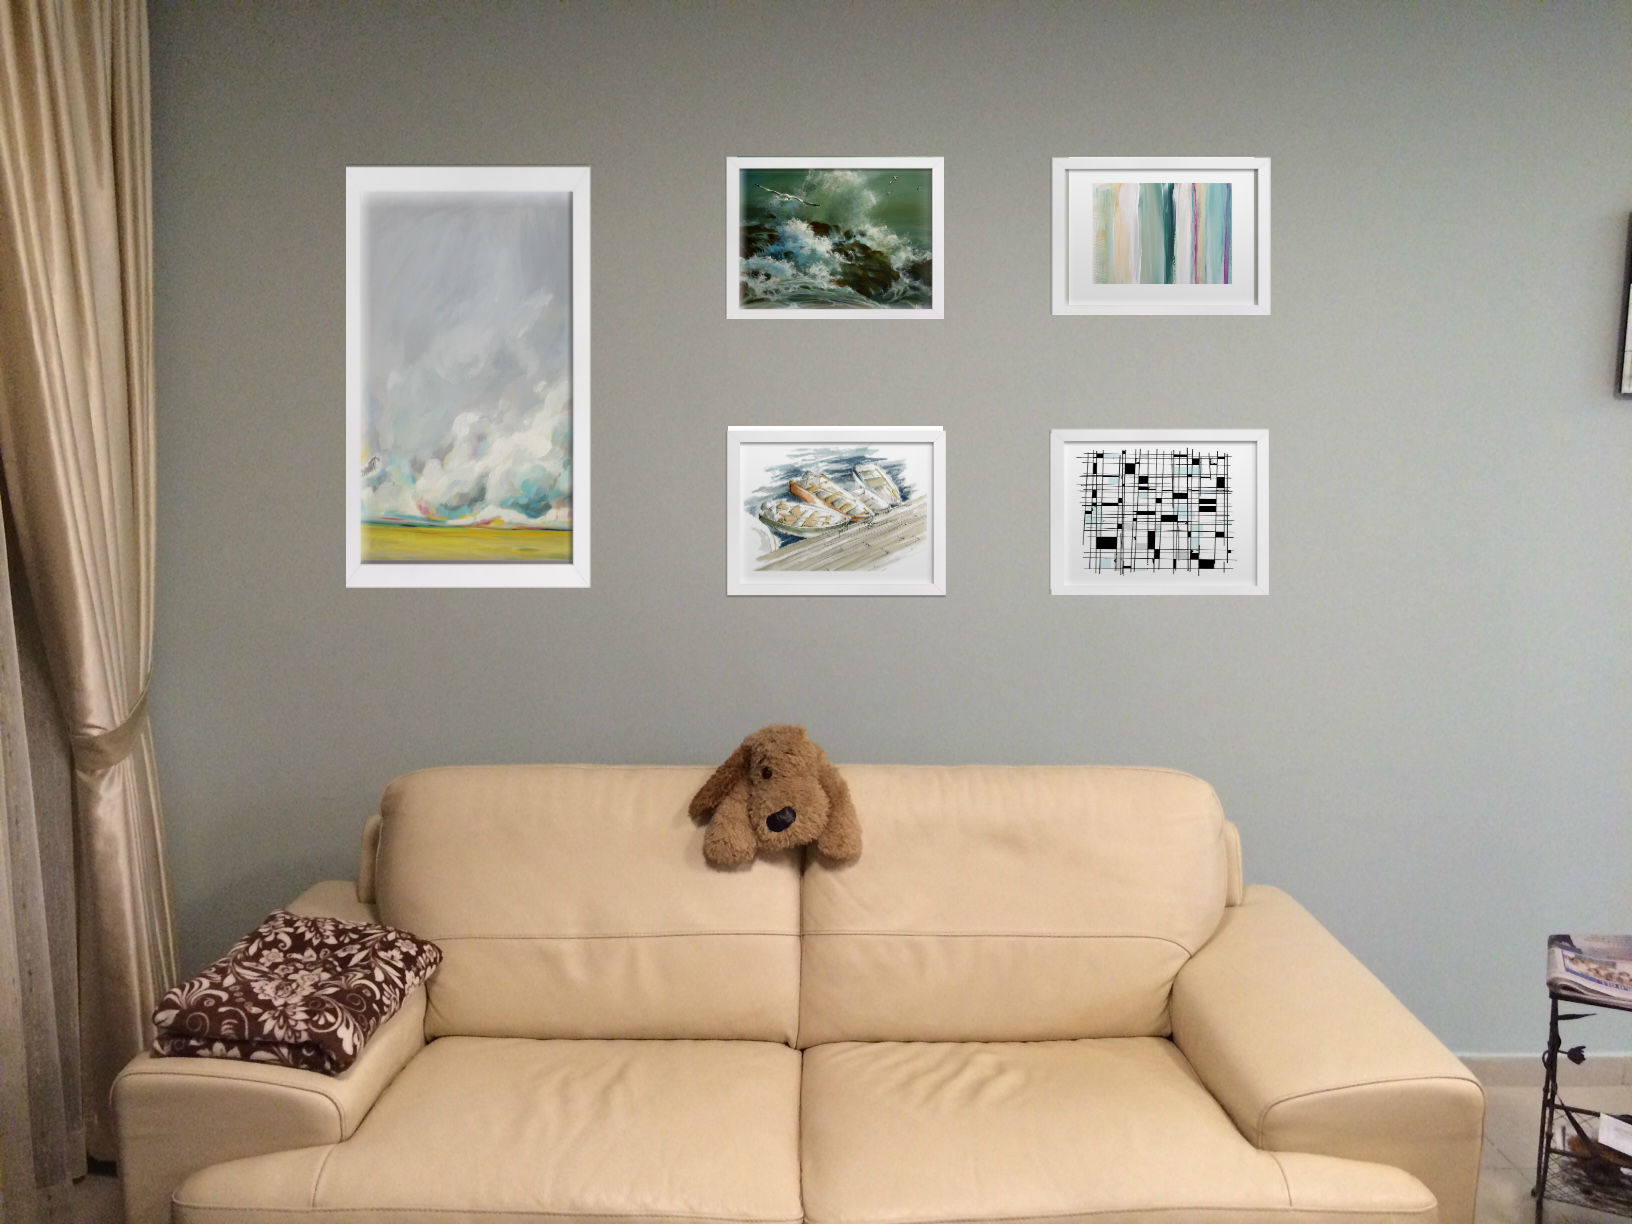 Planning wall art